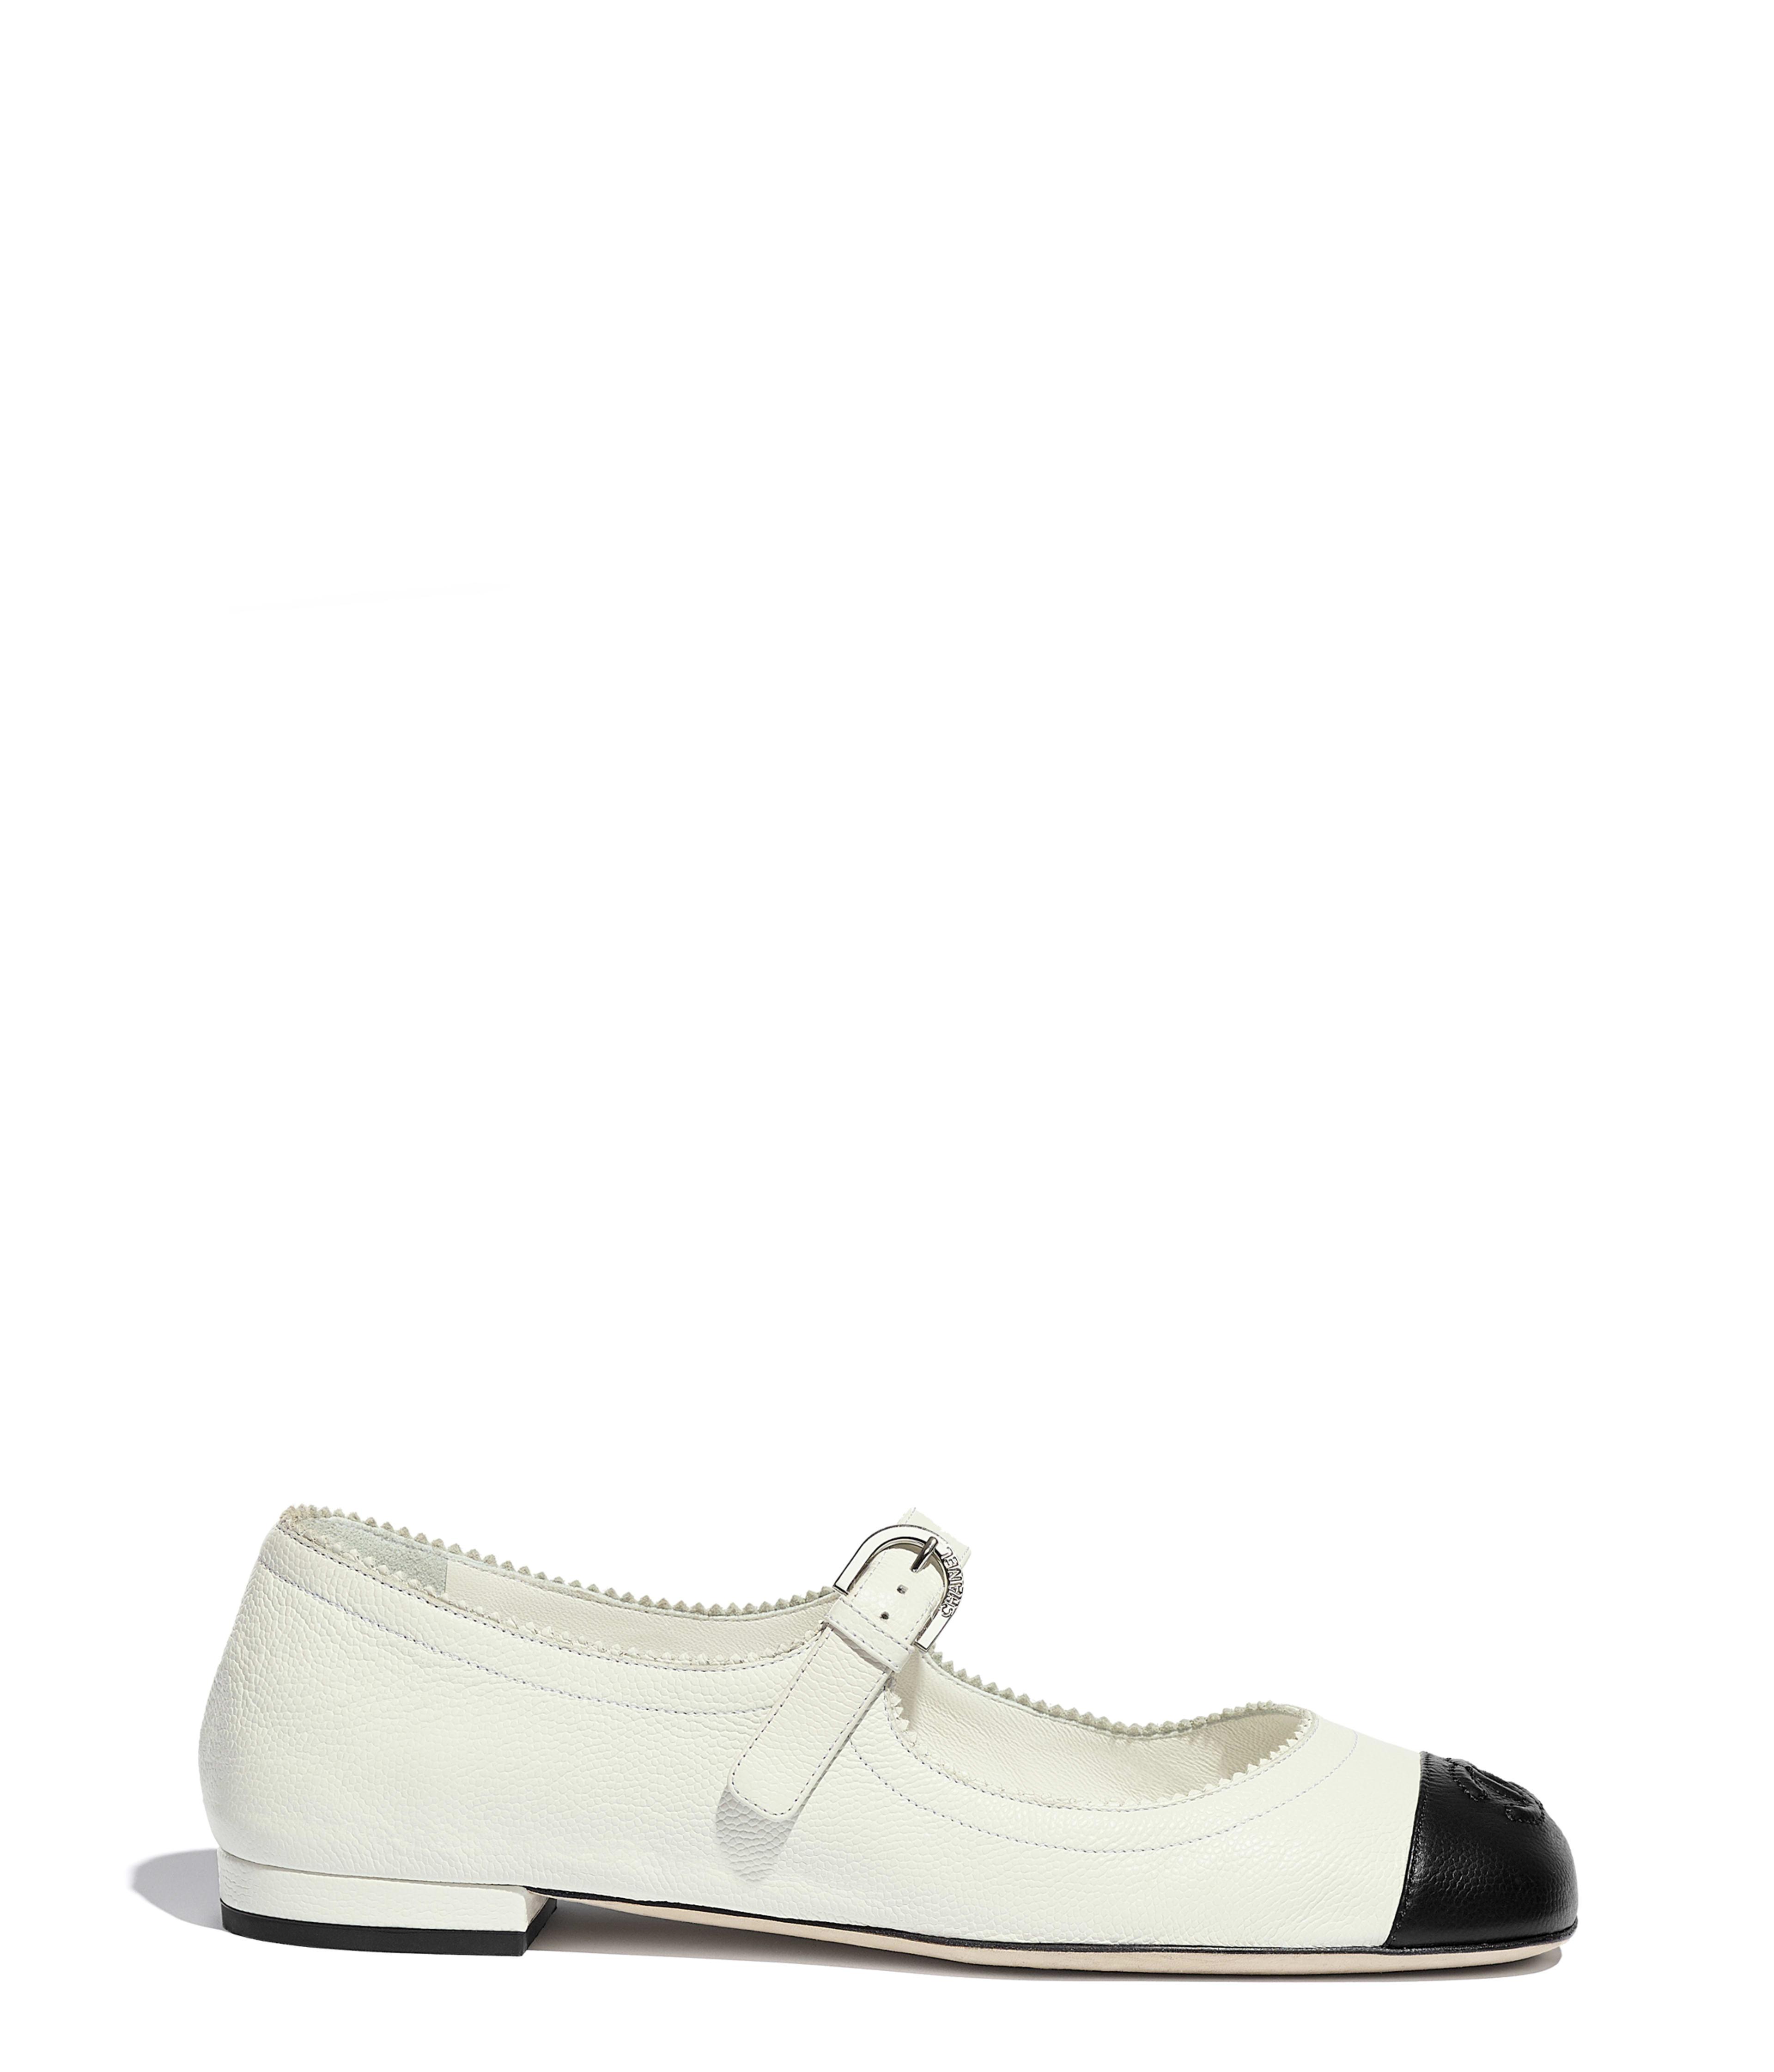 Ballerinas - Shoes | CHANEL